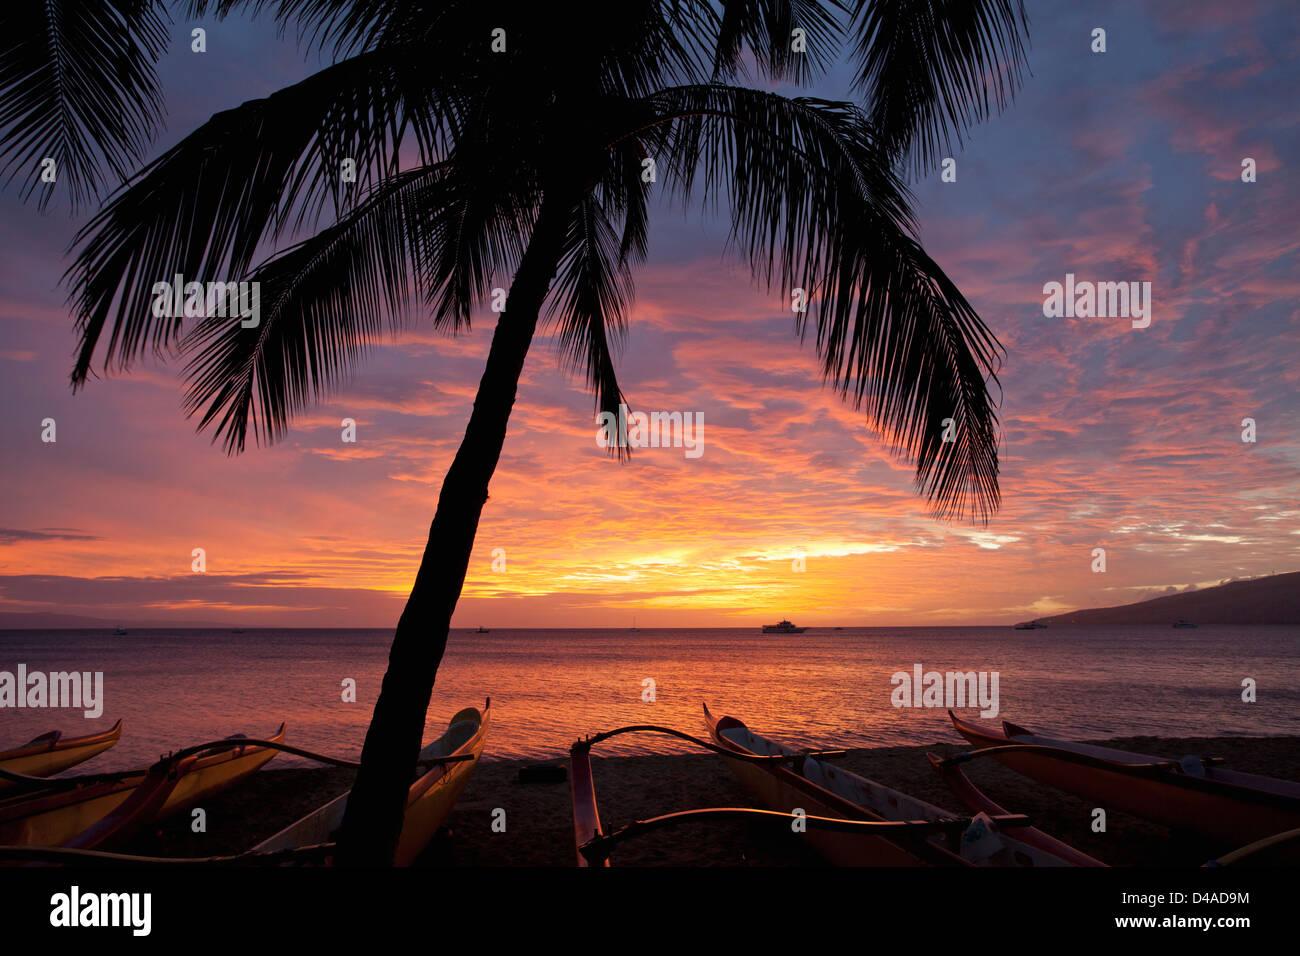 Spectacular sunset at Kihei, Maui, Hawaii. Stock Photo